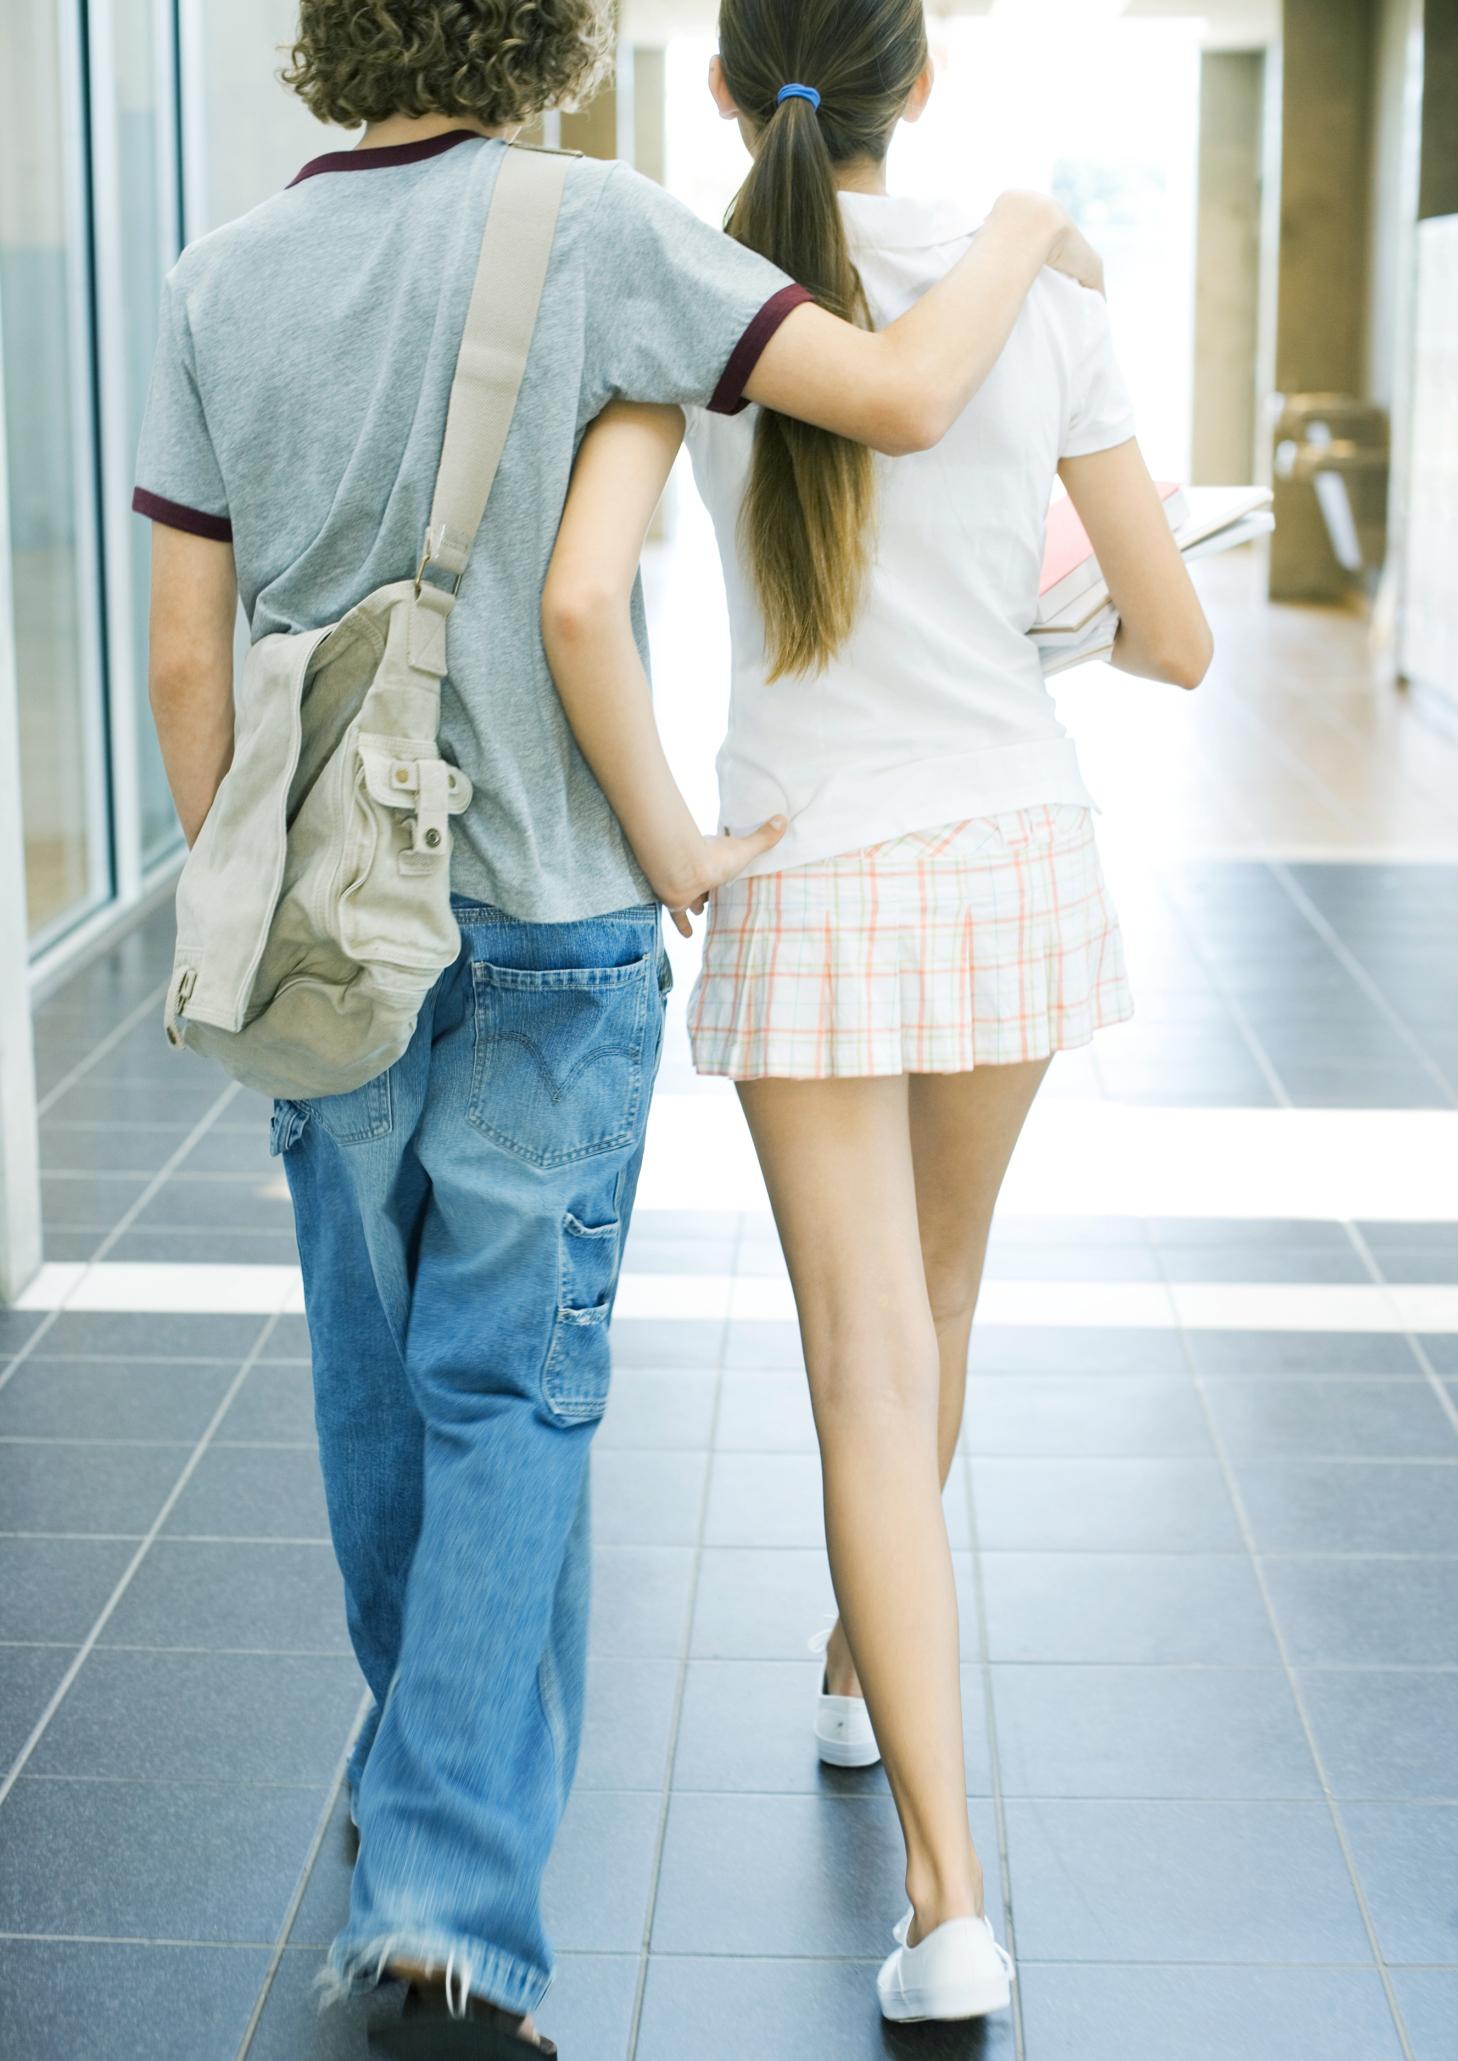 How School Dress Codes Shame Girls and Perpetuate Rape Culture